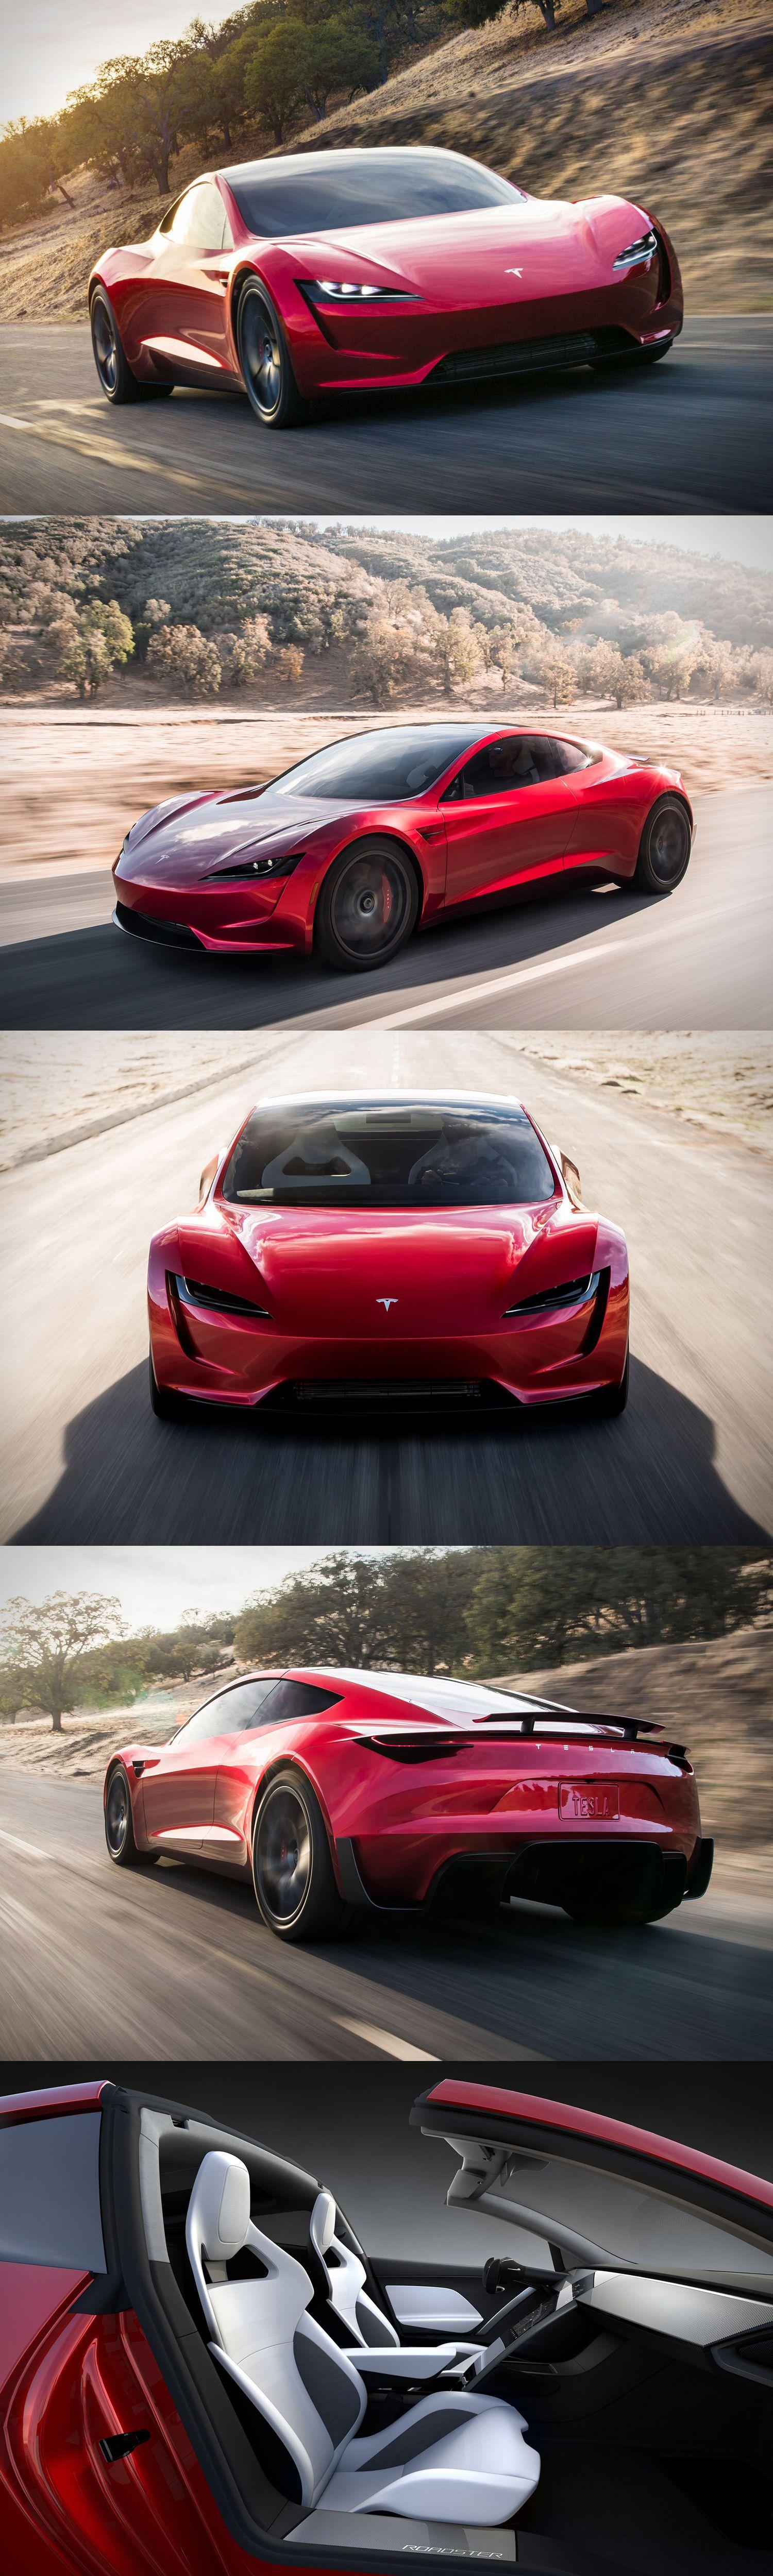 Tesla Roadster Rides Pinterest Tesla Roadster Tesla Motors